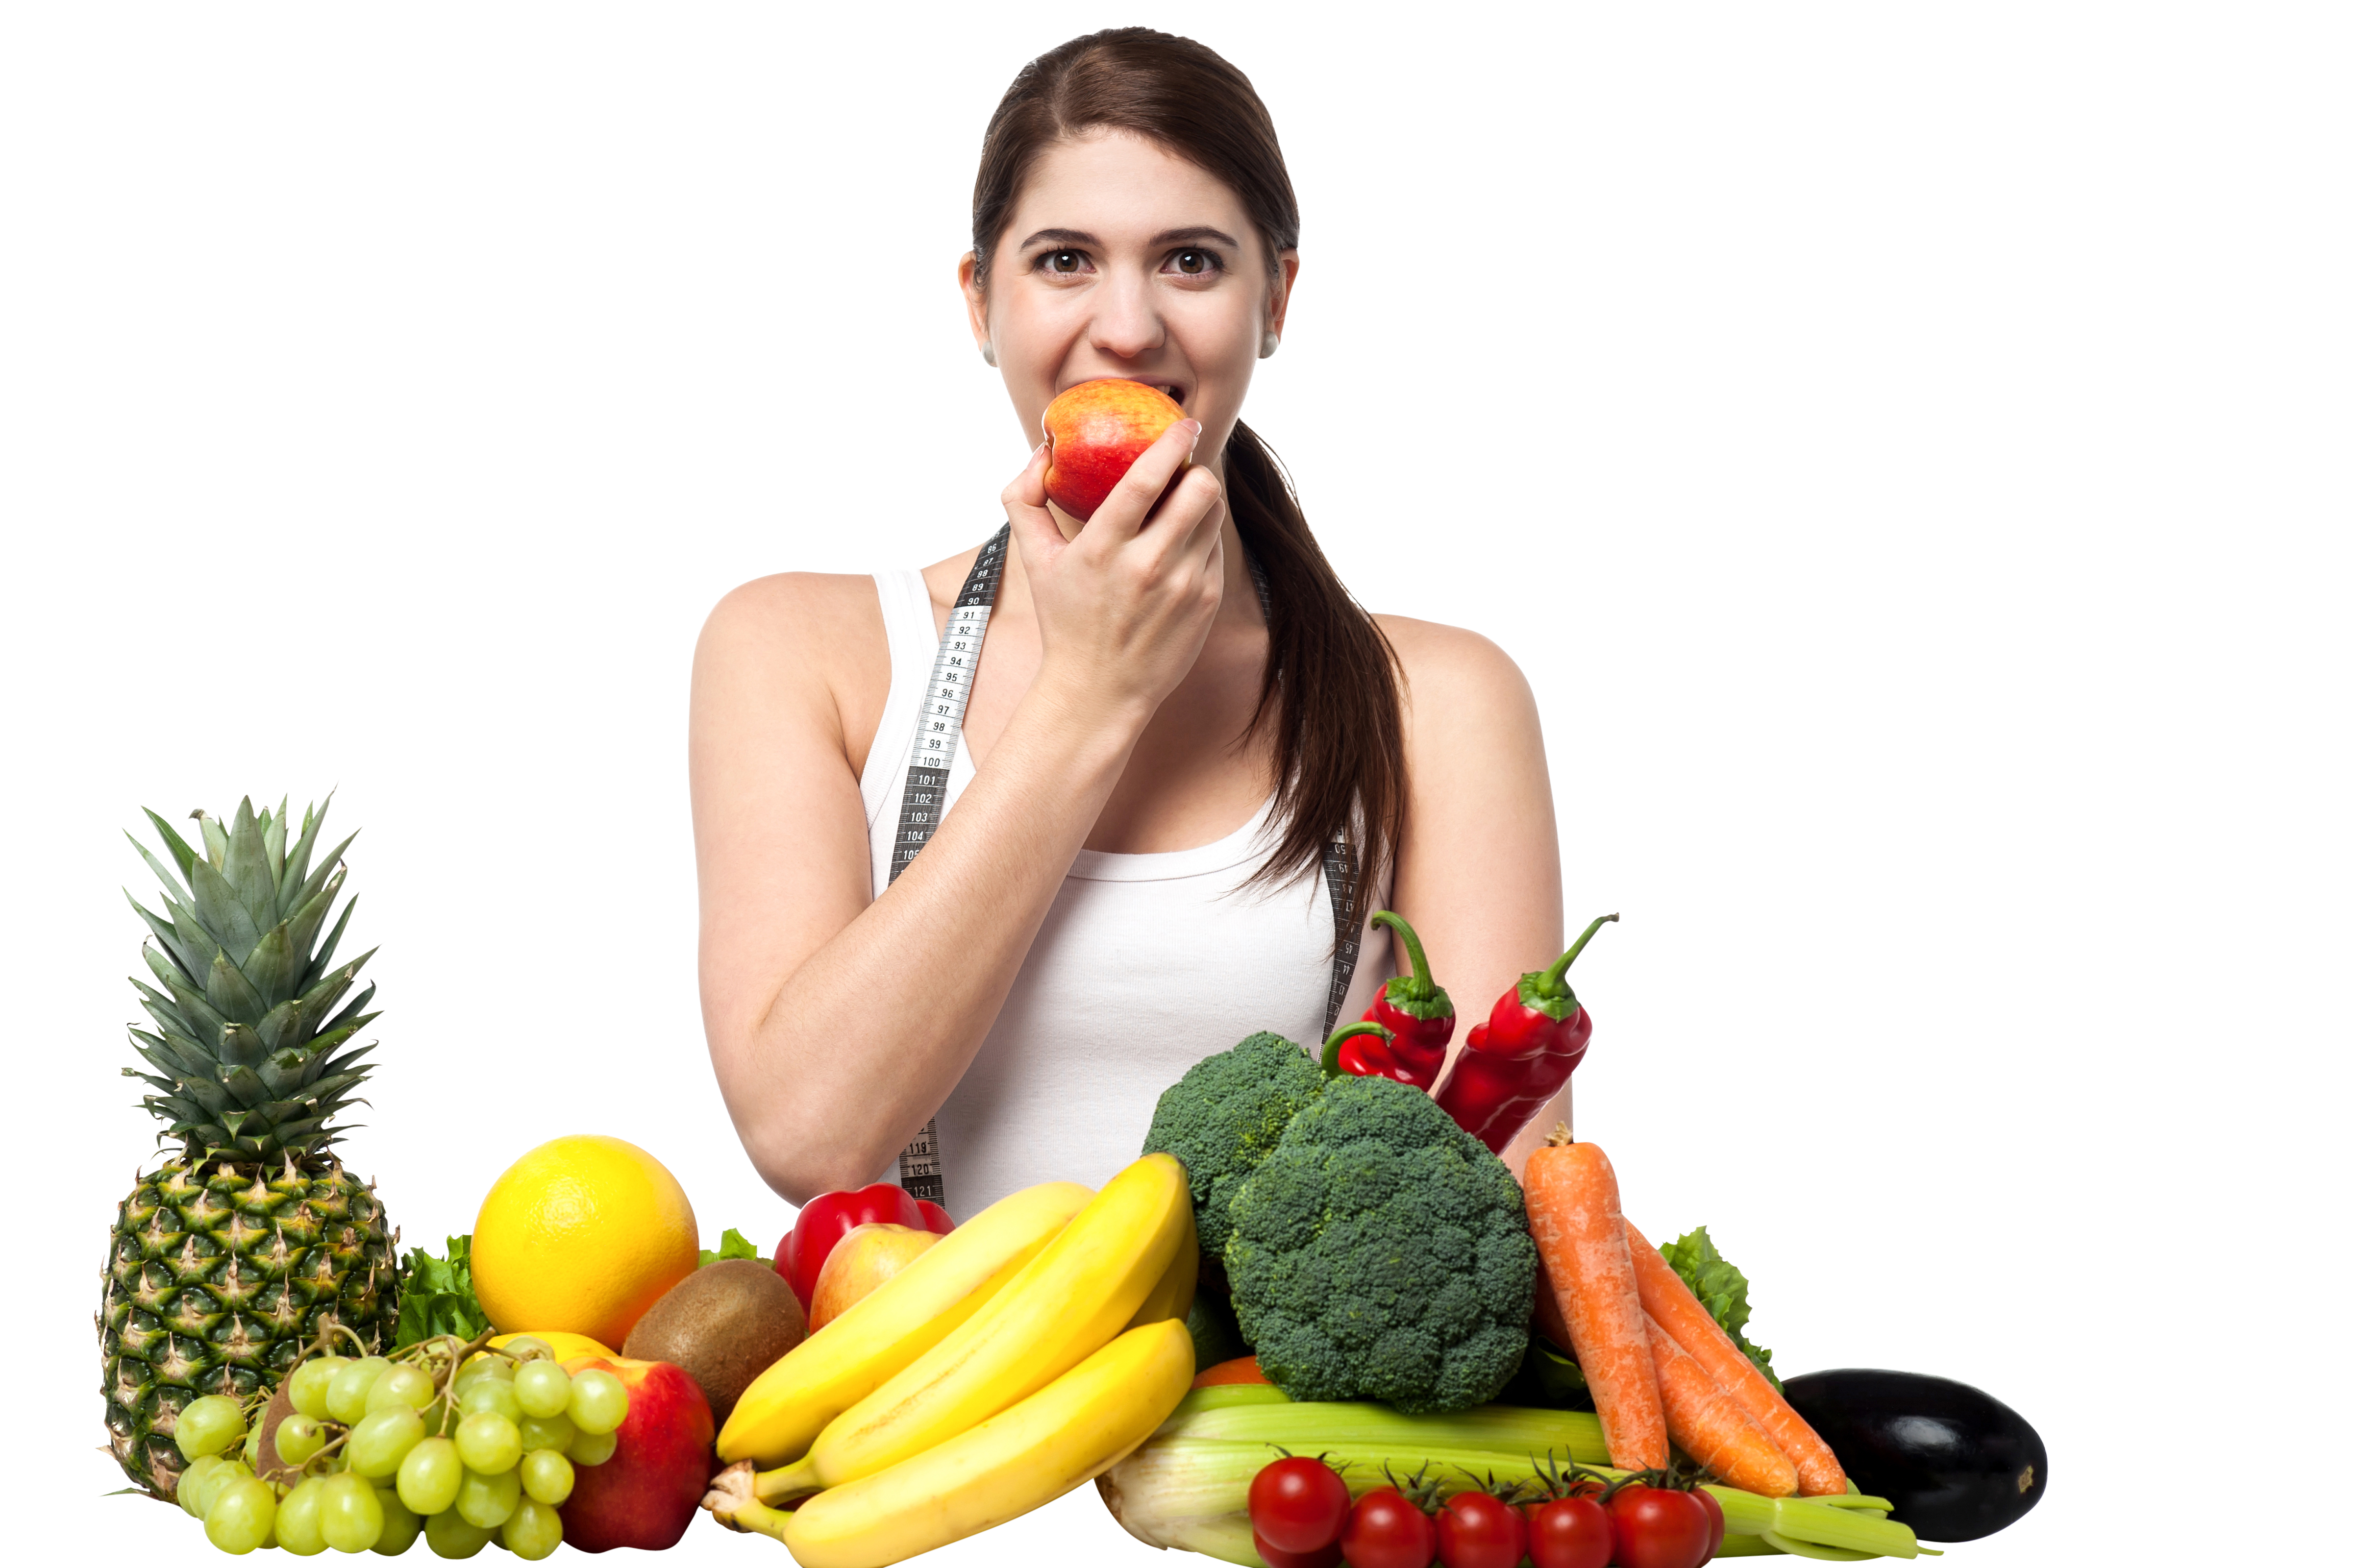 PNG Eating Food - 62639